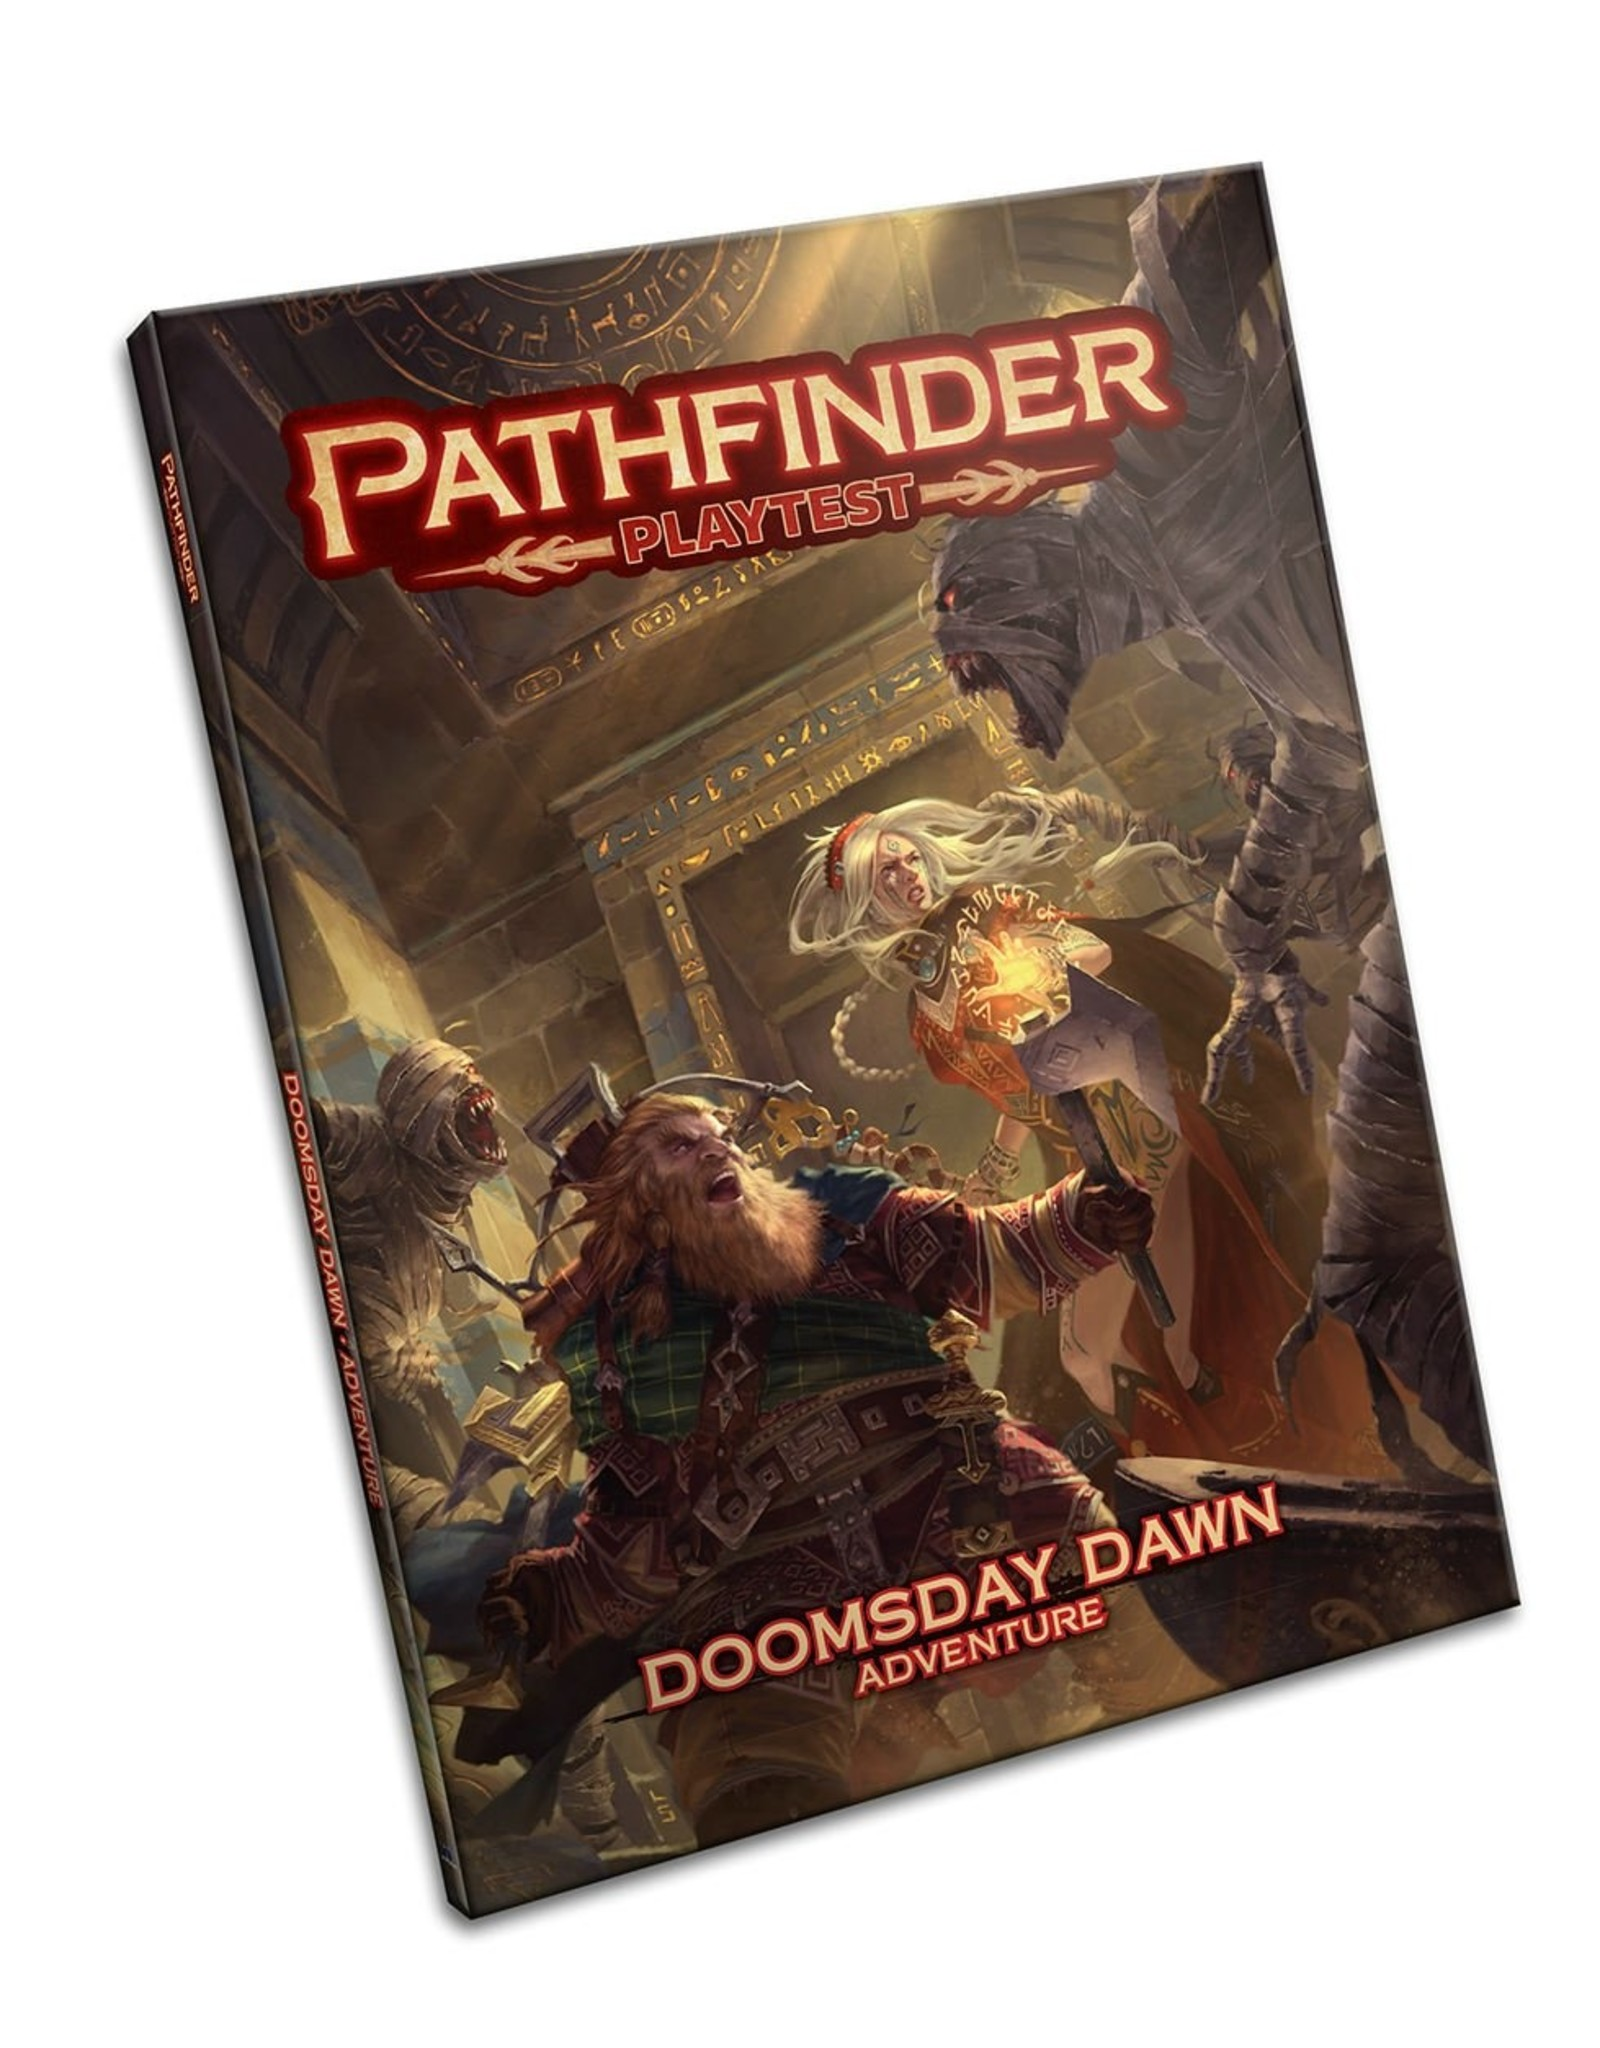 PAIZO PATHFINDER PLAYTEST ADVENTURE DOOMDAY DAWN